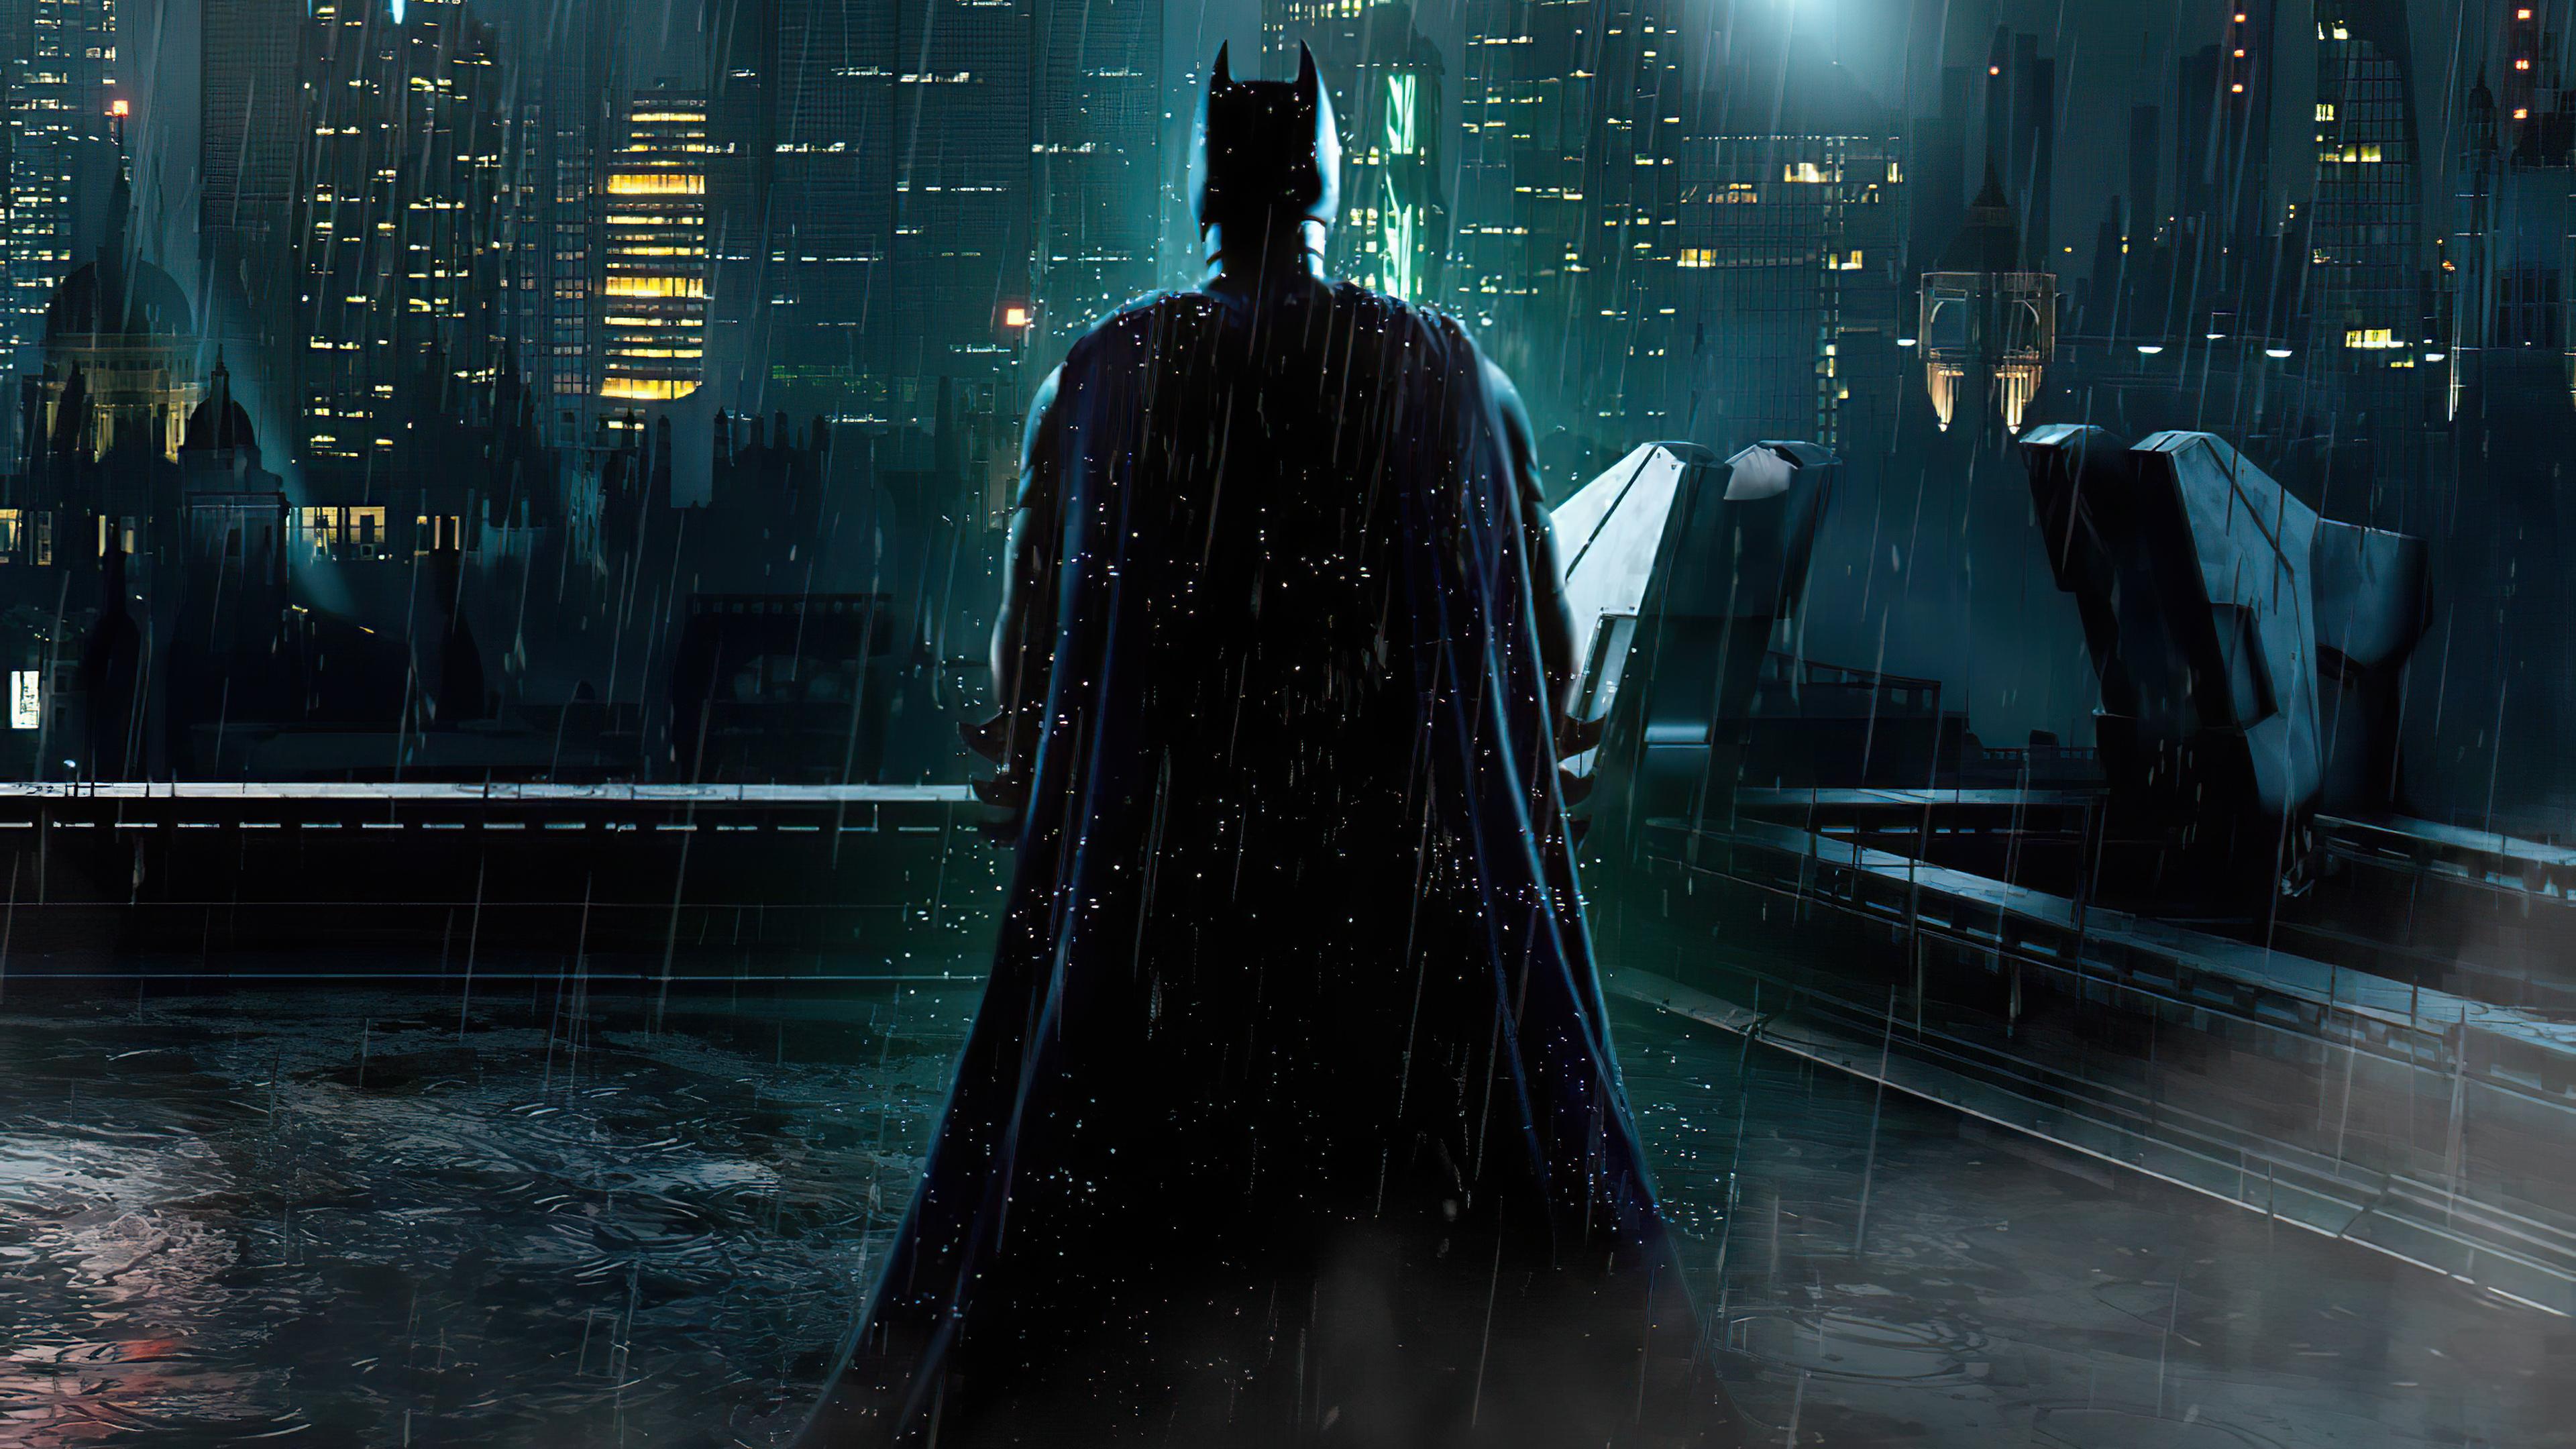 batman vs iron man rain 4k 1617446727 - Batman Vs Iron Man Rain 4k - Batman Vs Iron Man Rain 4k wallpapers